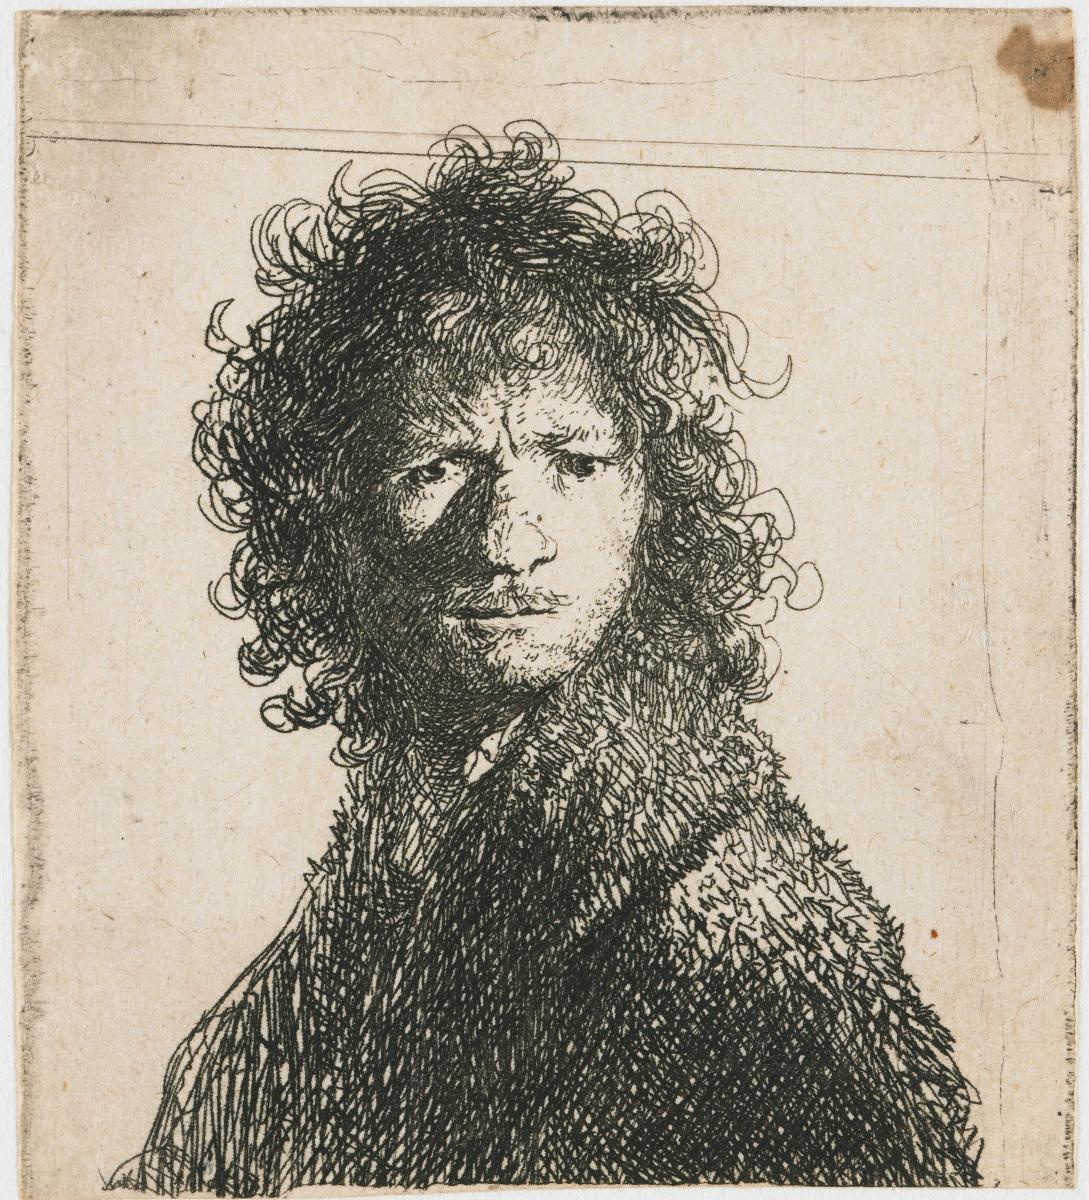 Рембрандт Харменс ван Рейн. Автопортрет нахмурившийся